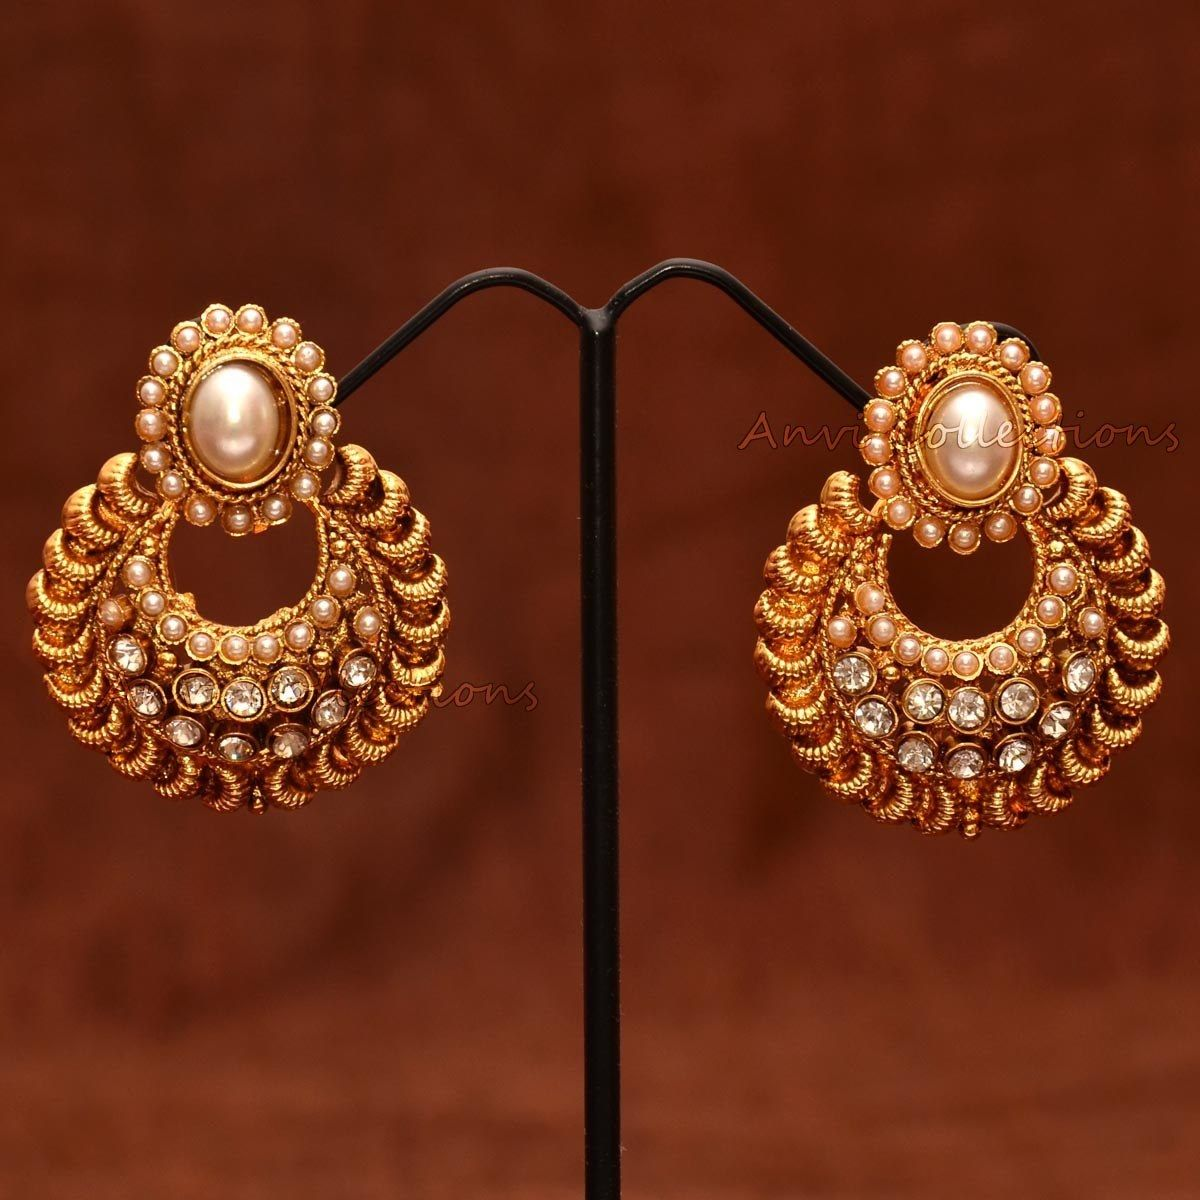 Ram leela chand bali earrings http://a